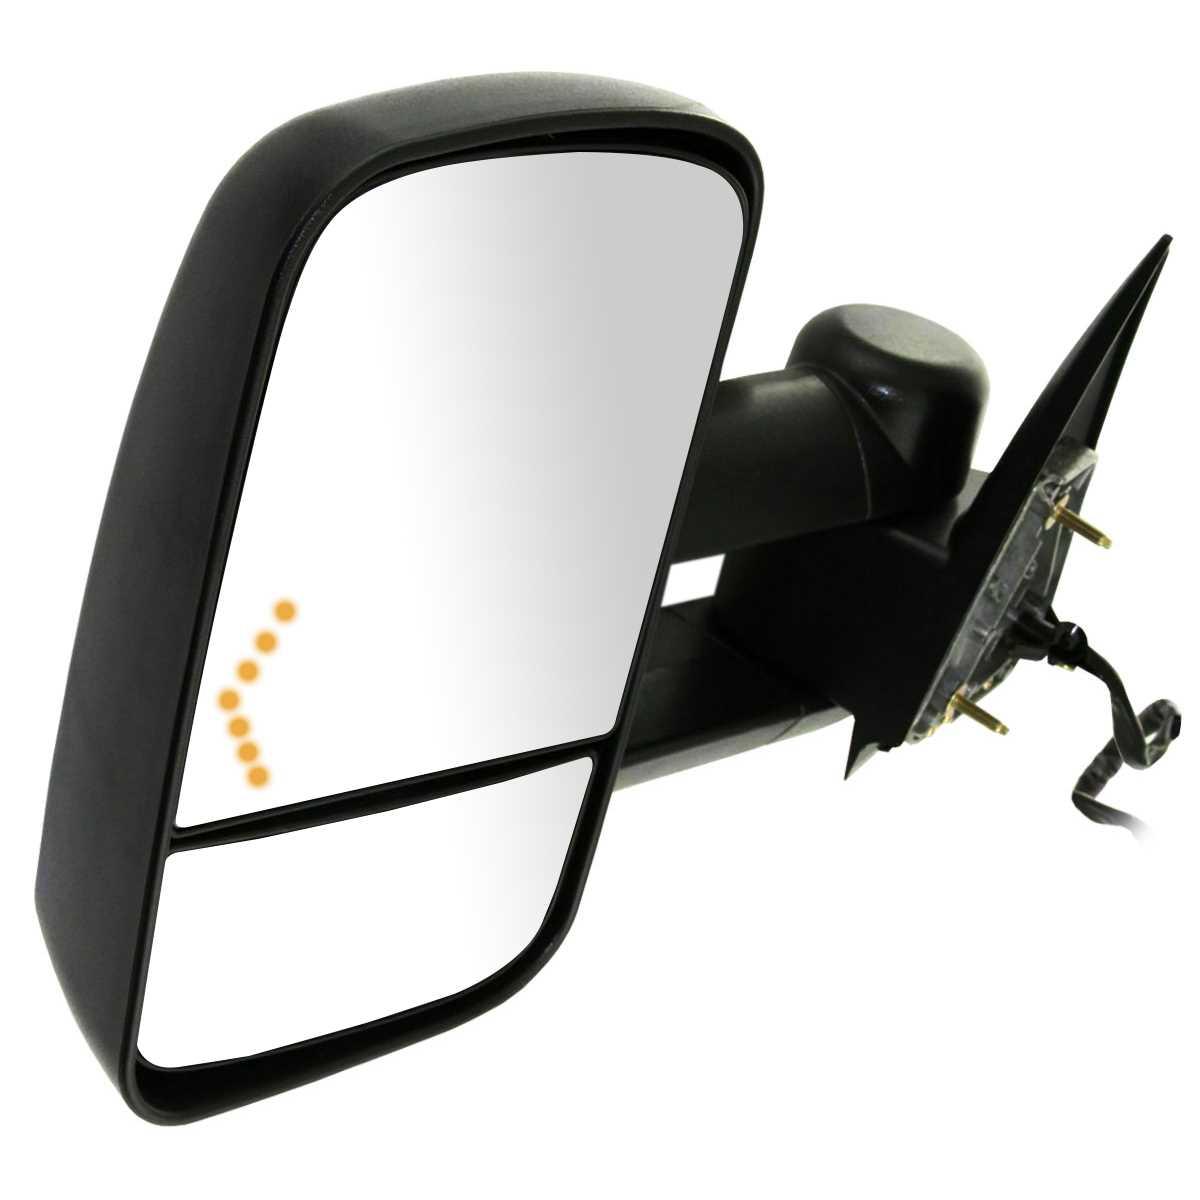 Power-Heated-Tow-Mirrors-Set-Fits-03-07-Silverado-Sierra-Pickup-W-LED-Signals